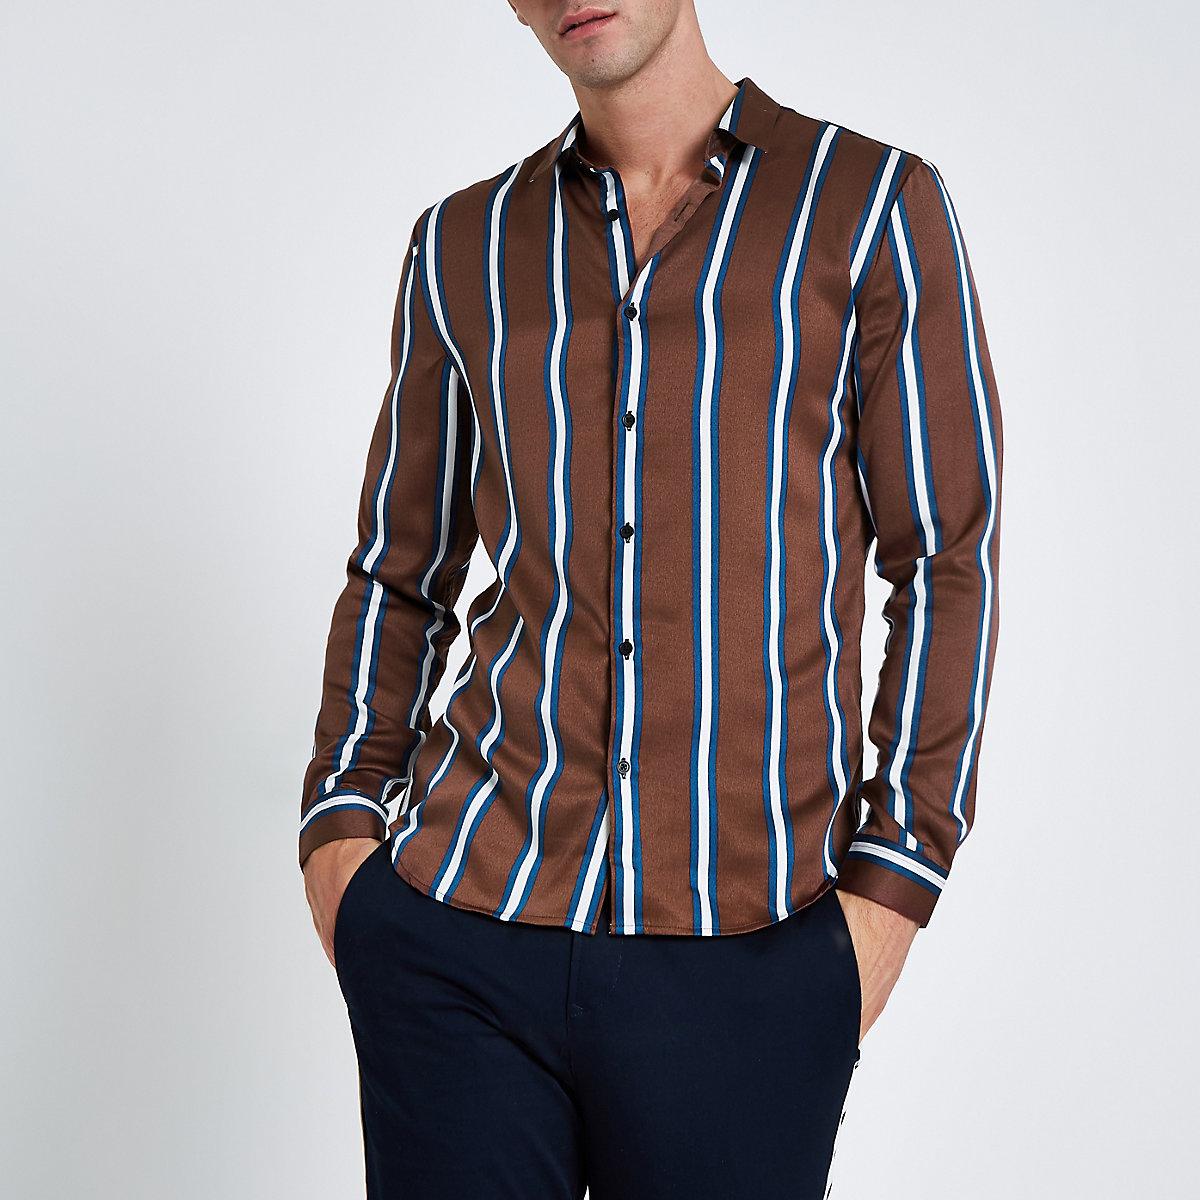 Braunes, gestreiftes Langarmhemd aus Satin